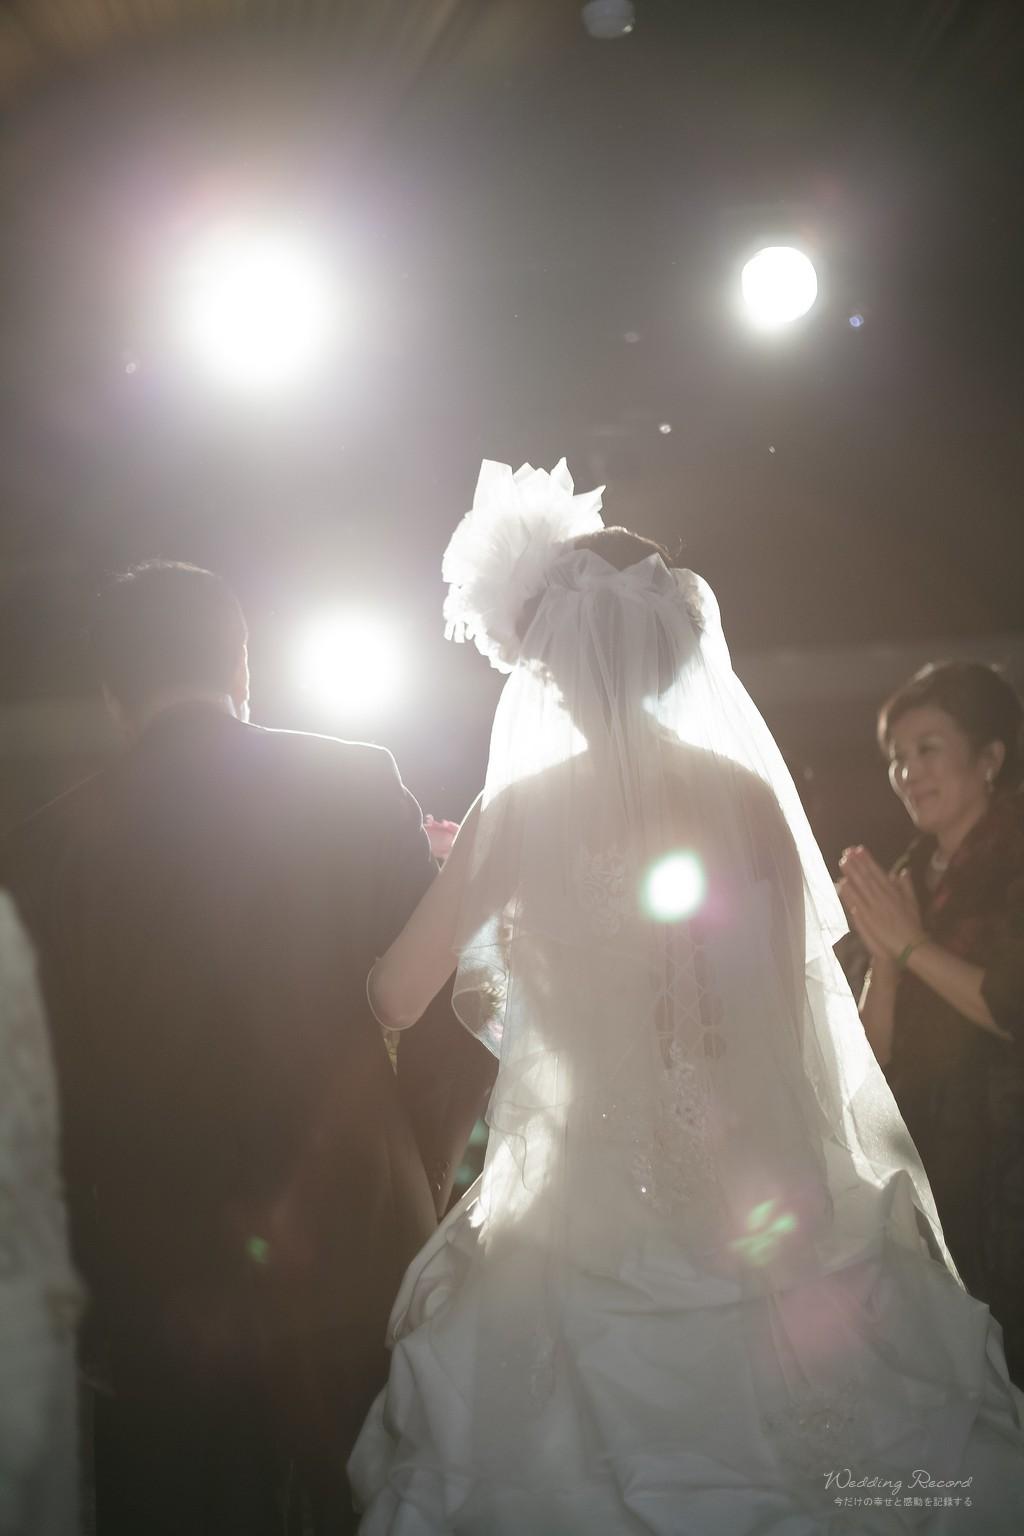 7060571731_d3f4a2da35_o-法鬥影像工作室_婚攝, 婚禮攝影, 婚禮紀錄, 婚紗攝影, 自助婚紗, 婚攝推薦, 攝影棚出租, 攝影棚租借, 孕婦禮服出租, 孕婦禮服租借, CEO專業形象照, 形像照, 型像照, 型象照. 形象照團拍, 全家福, 全家福團拍, 招團, 揪團拍, 親子寫真, 家庭寫真, 抓周, 抓周團拍